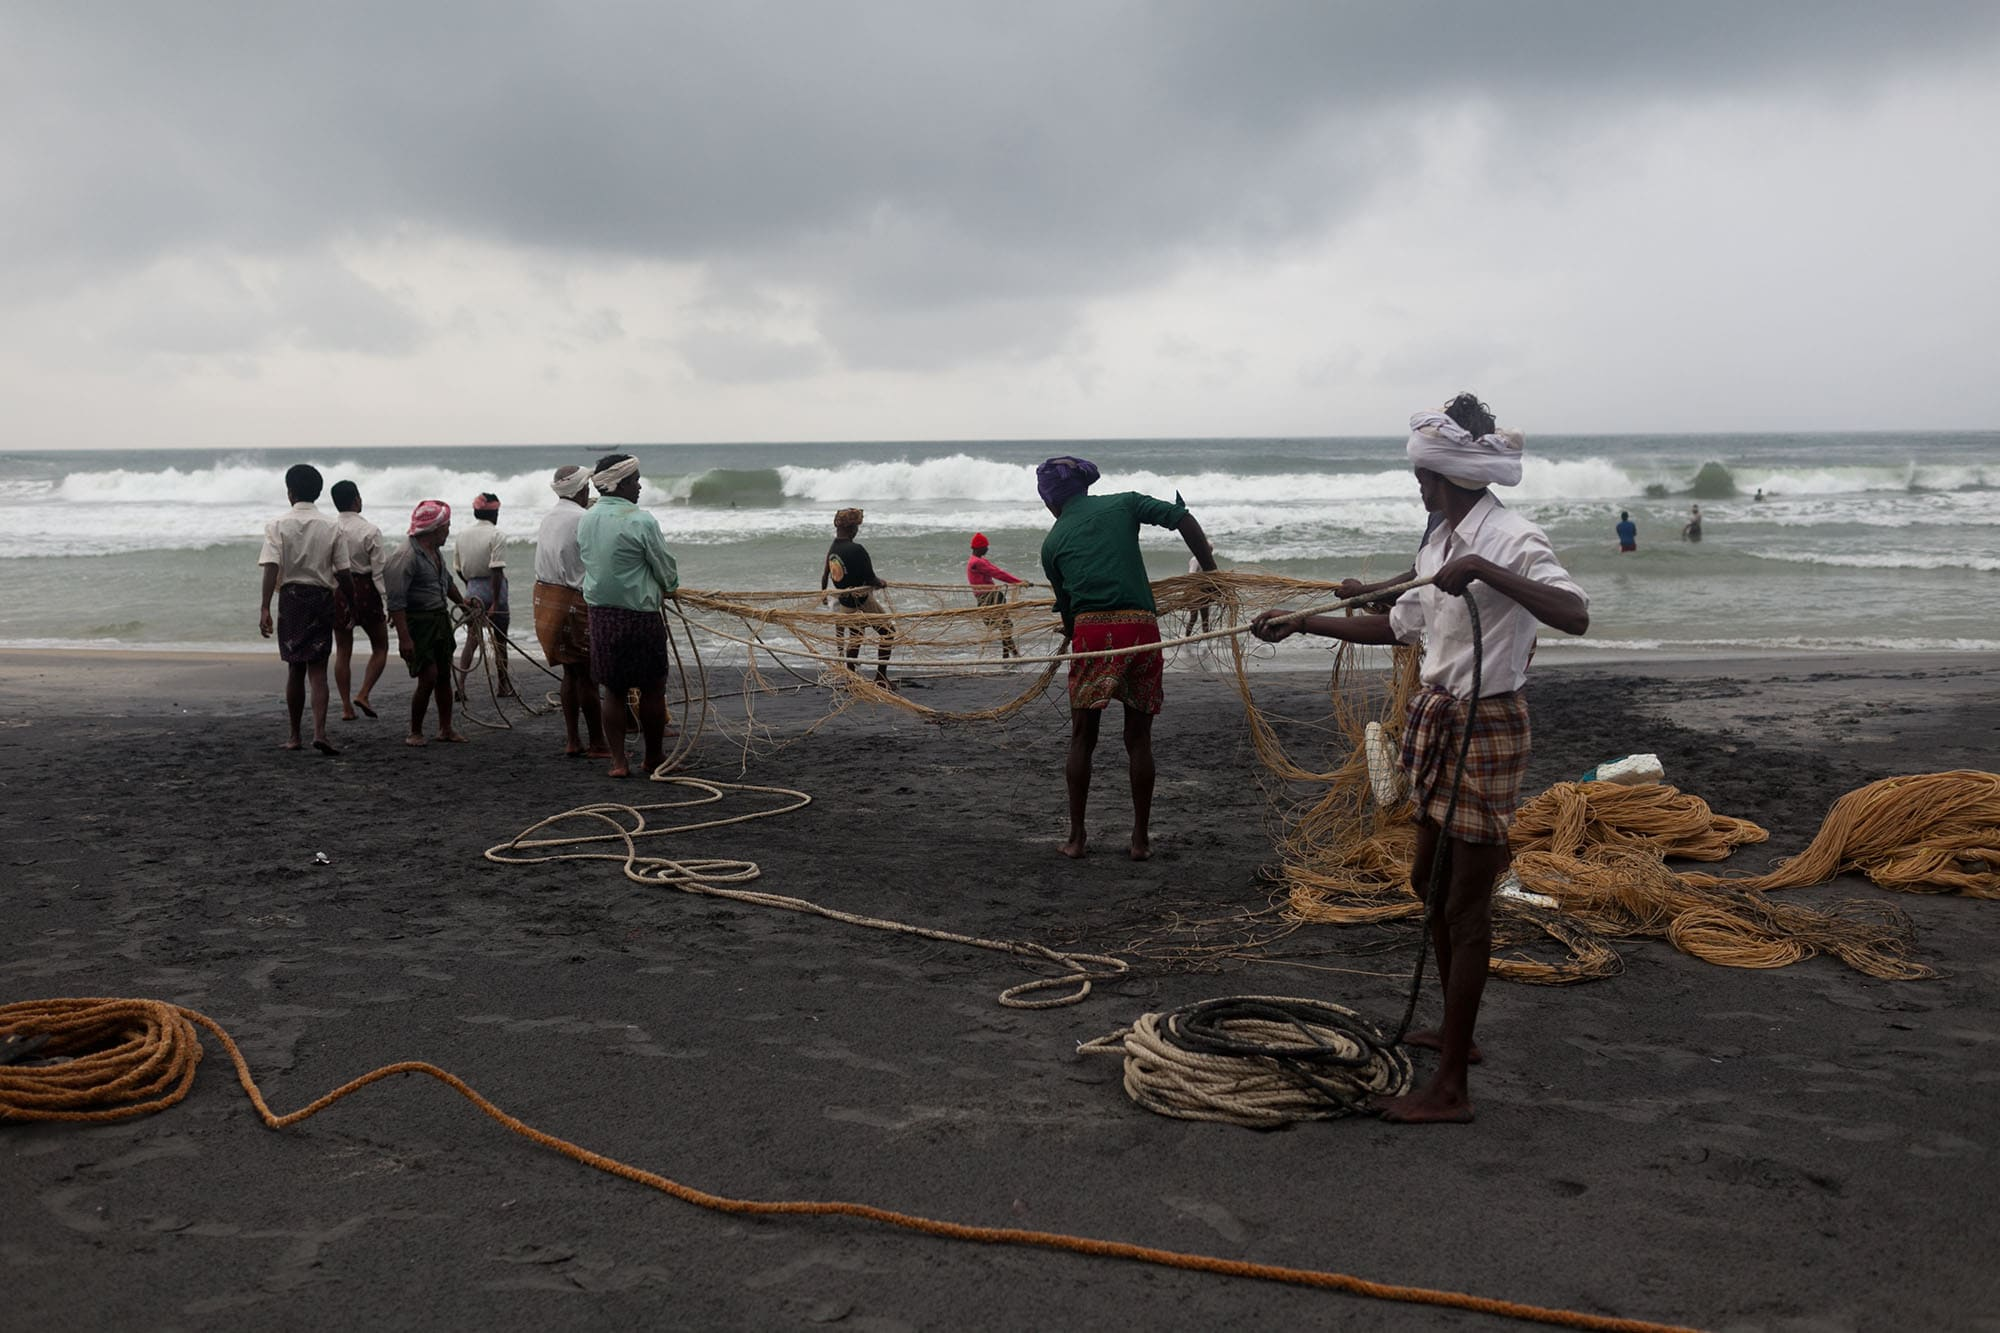 Kovalam Fishermen on the beach in India